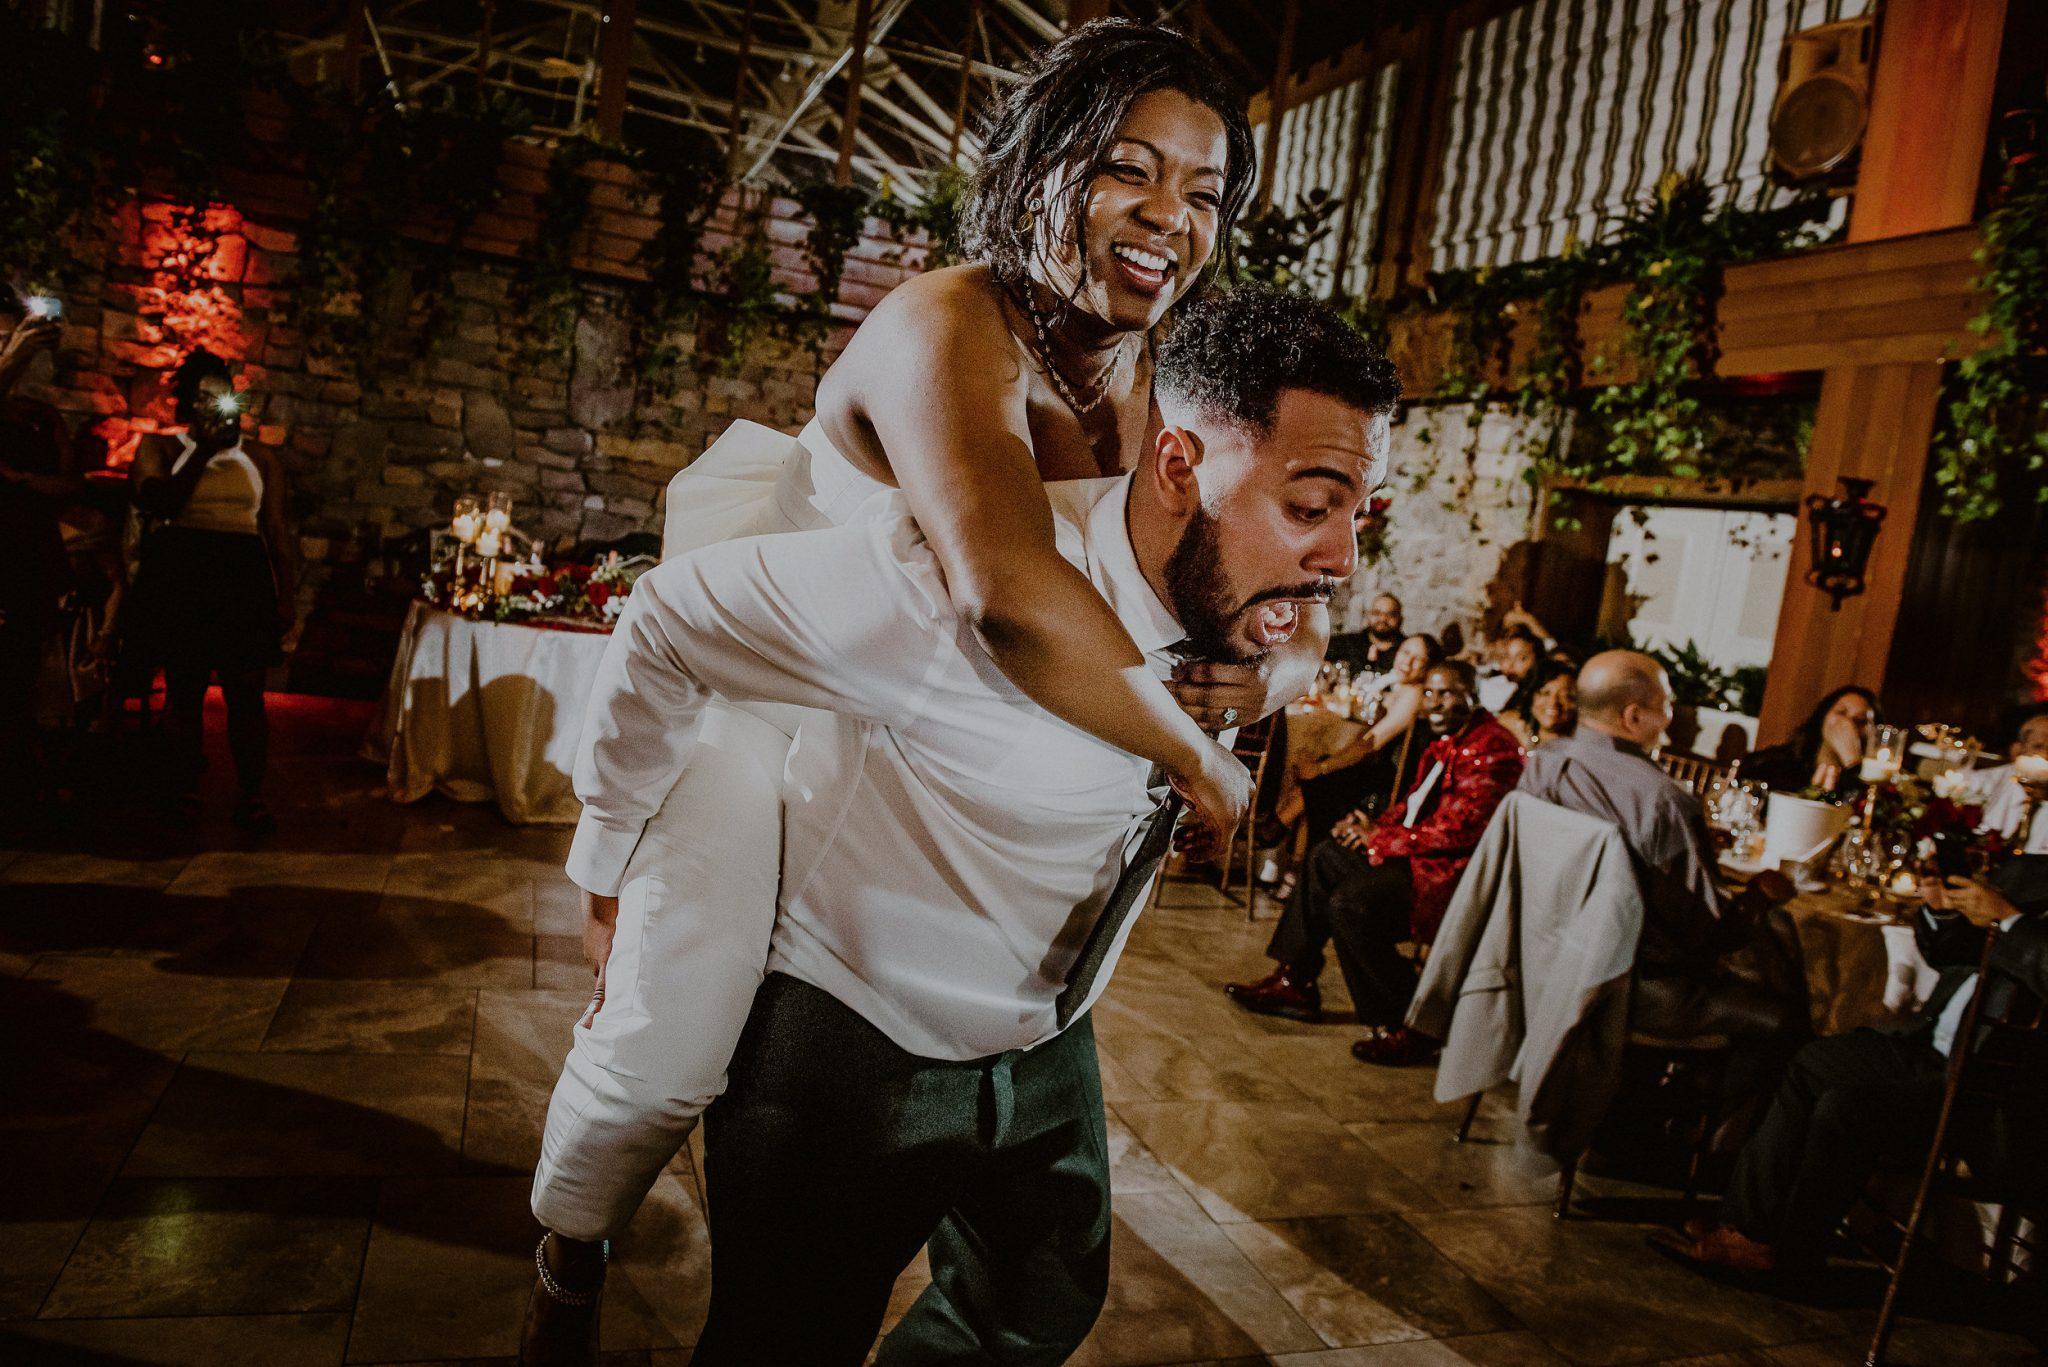 bride and groom on dance floor at fox hollow wedding reception